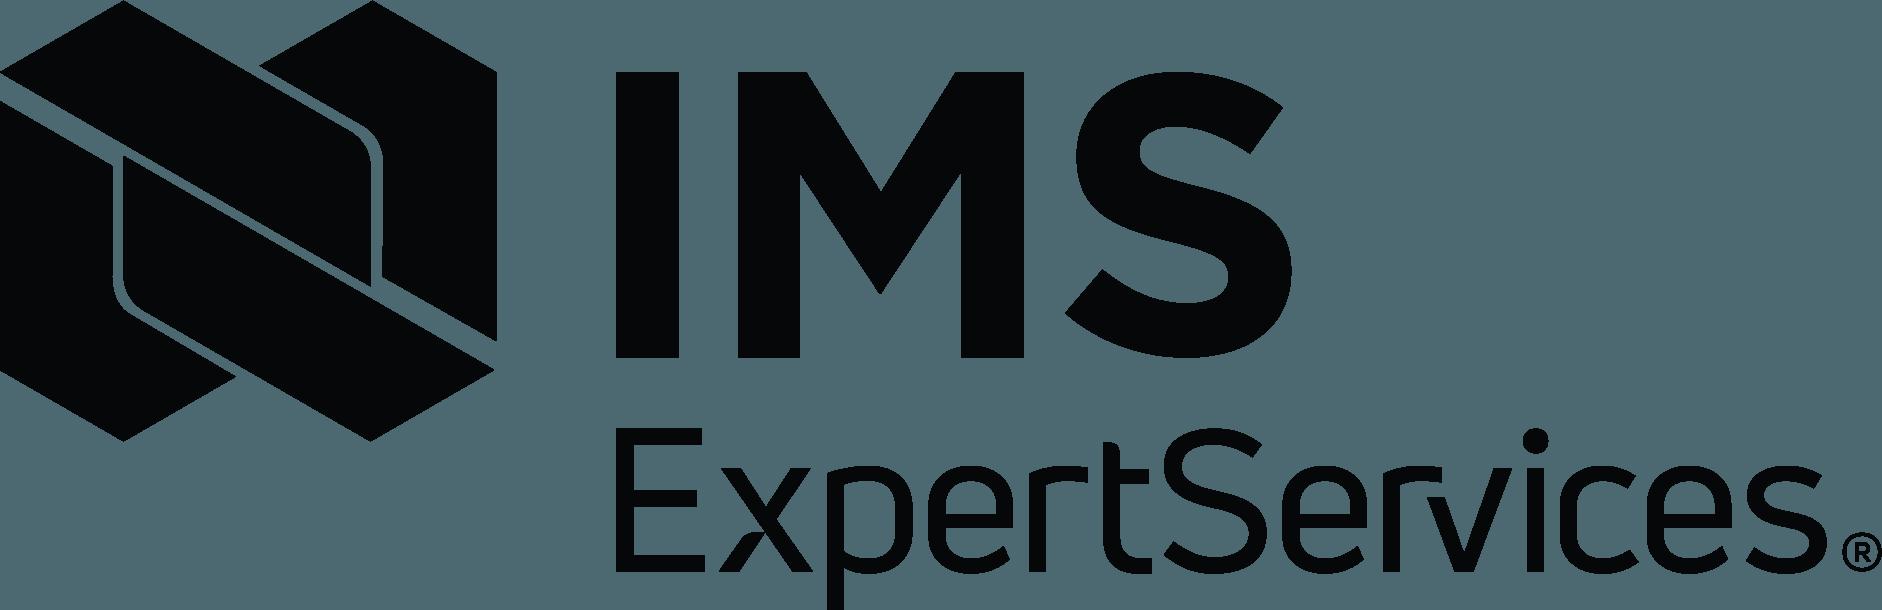 expert-services